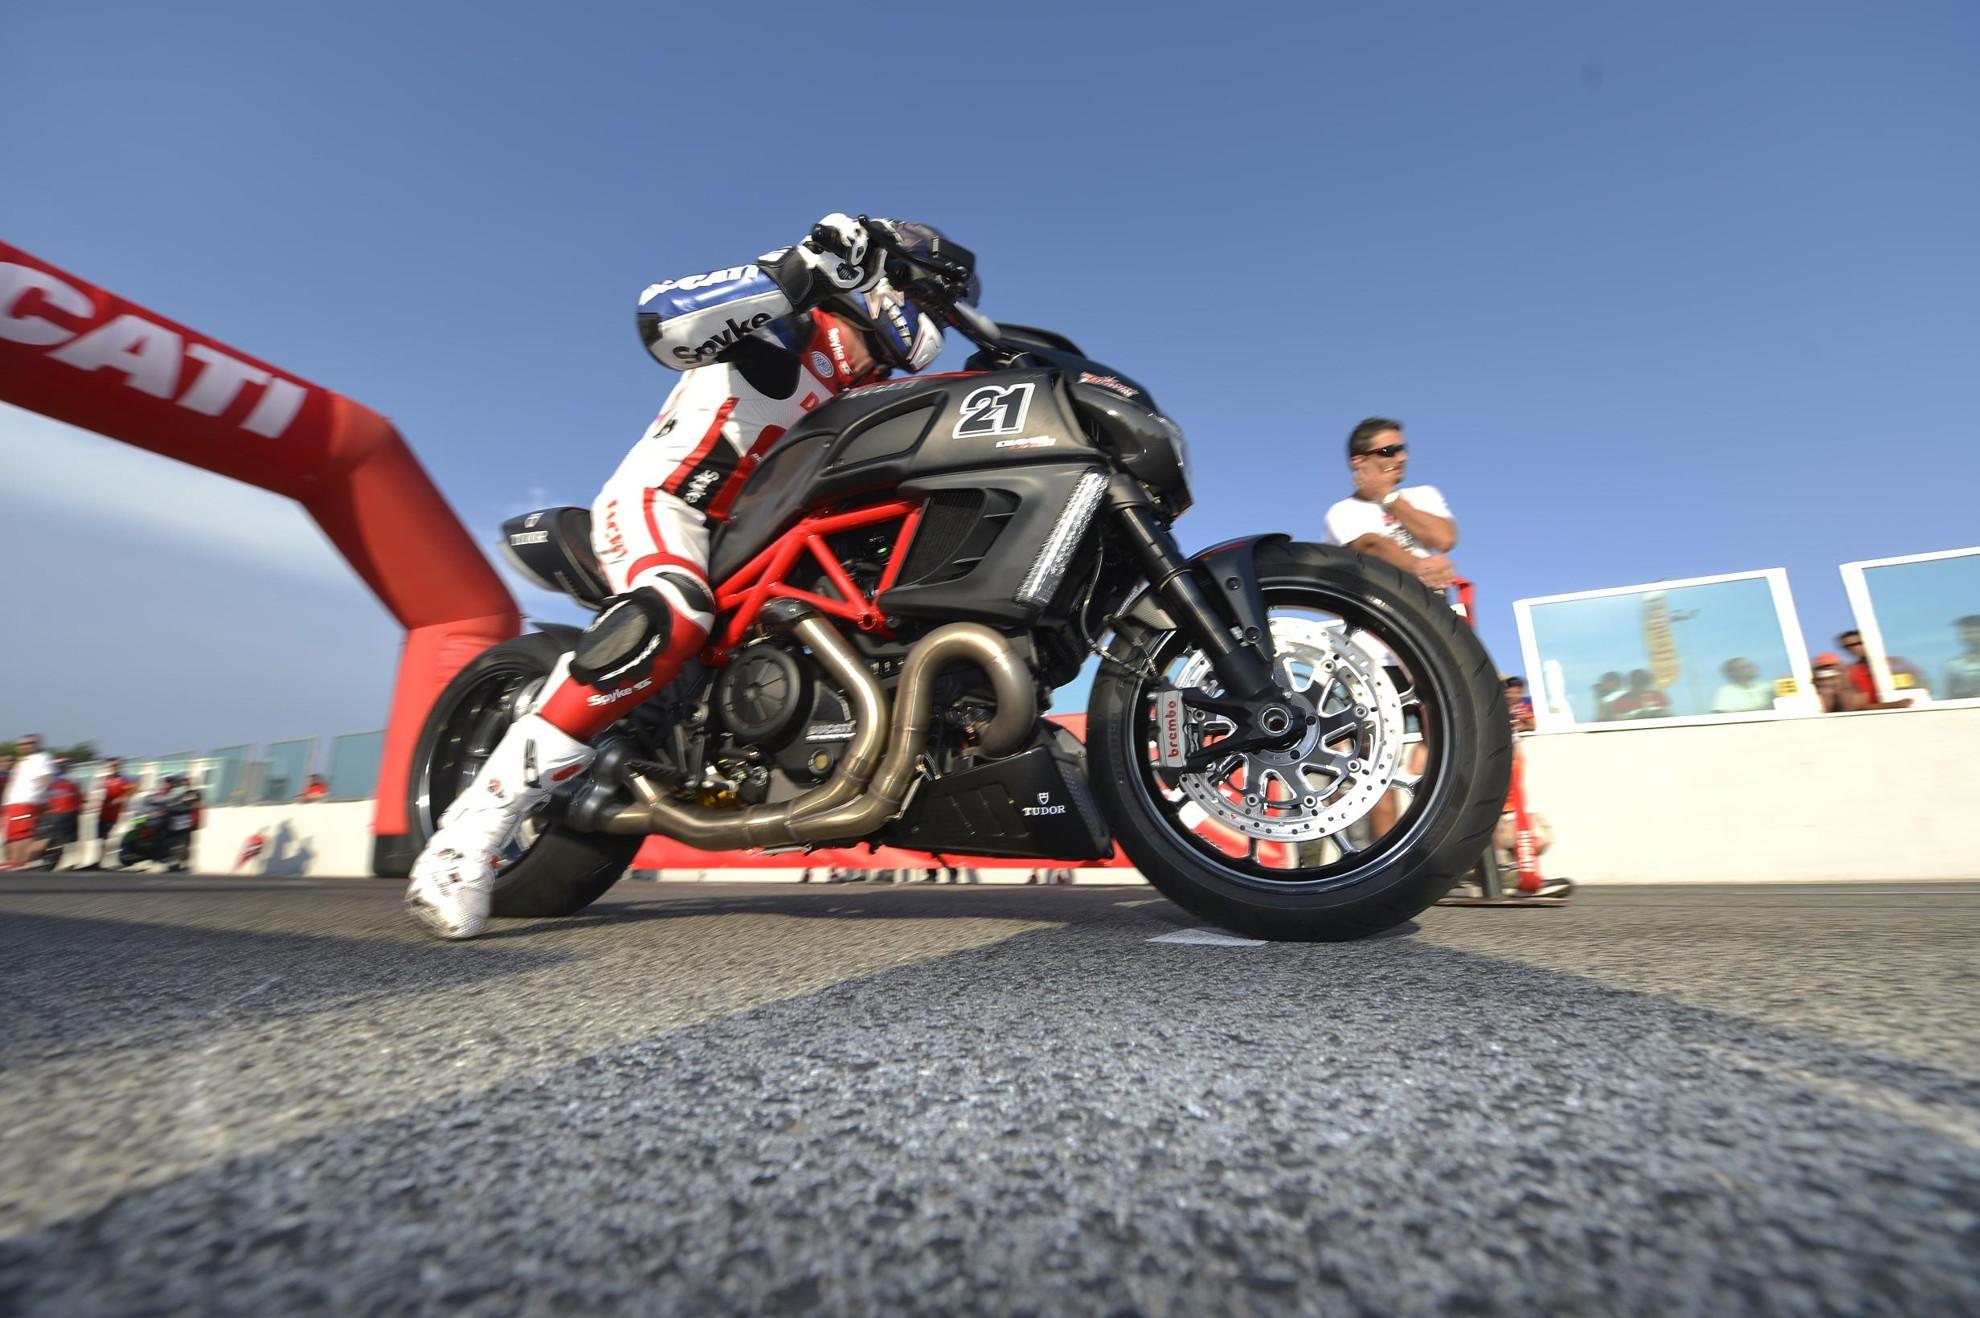 Ducati-Motorcycles